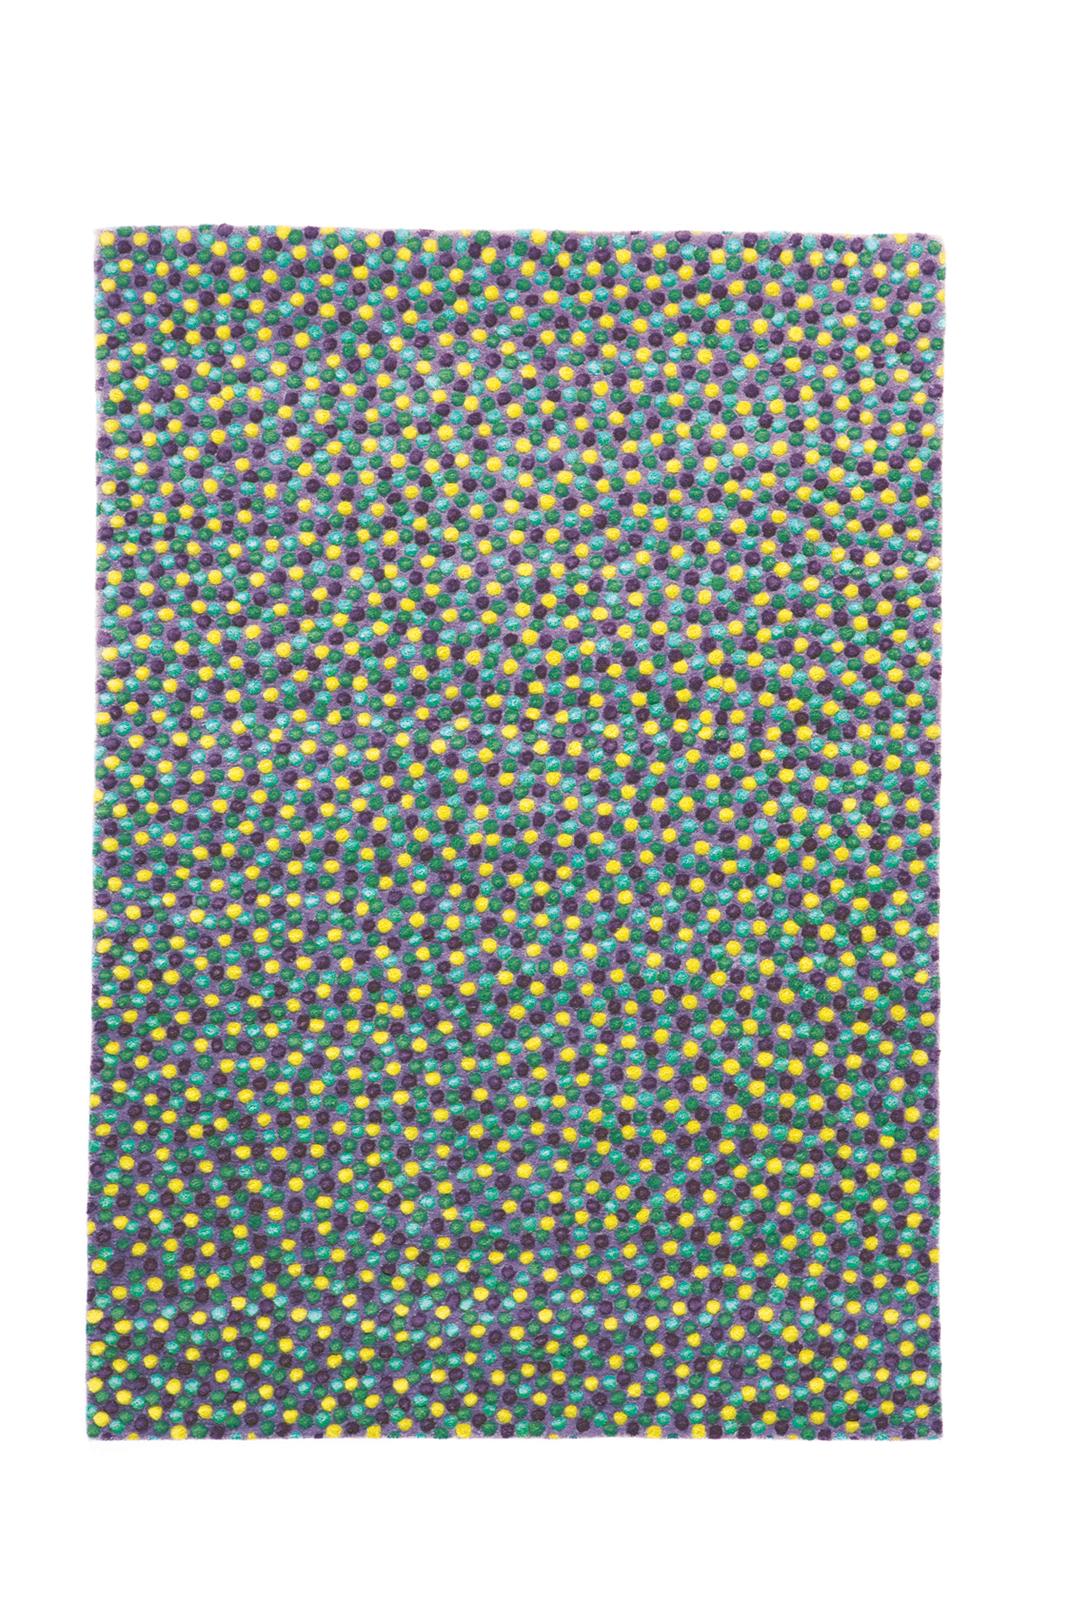 Topissimo rug designed by Nani Marquina